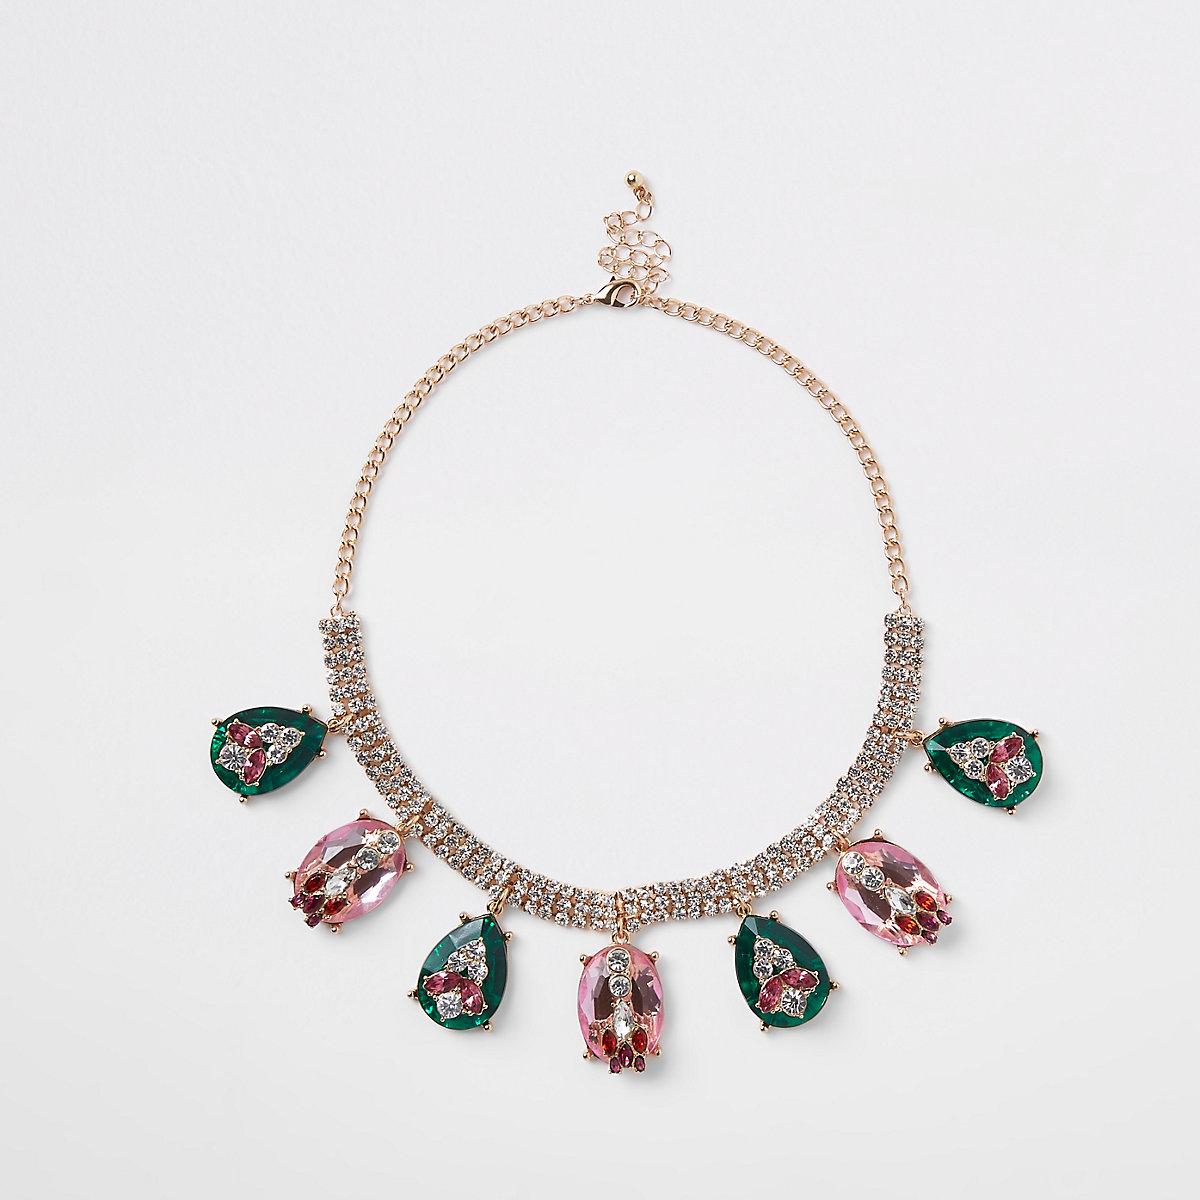 Gold tone diamante jewel embellished necklace